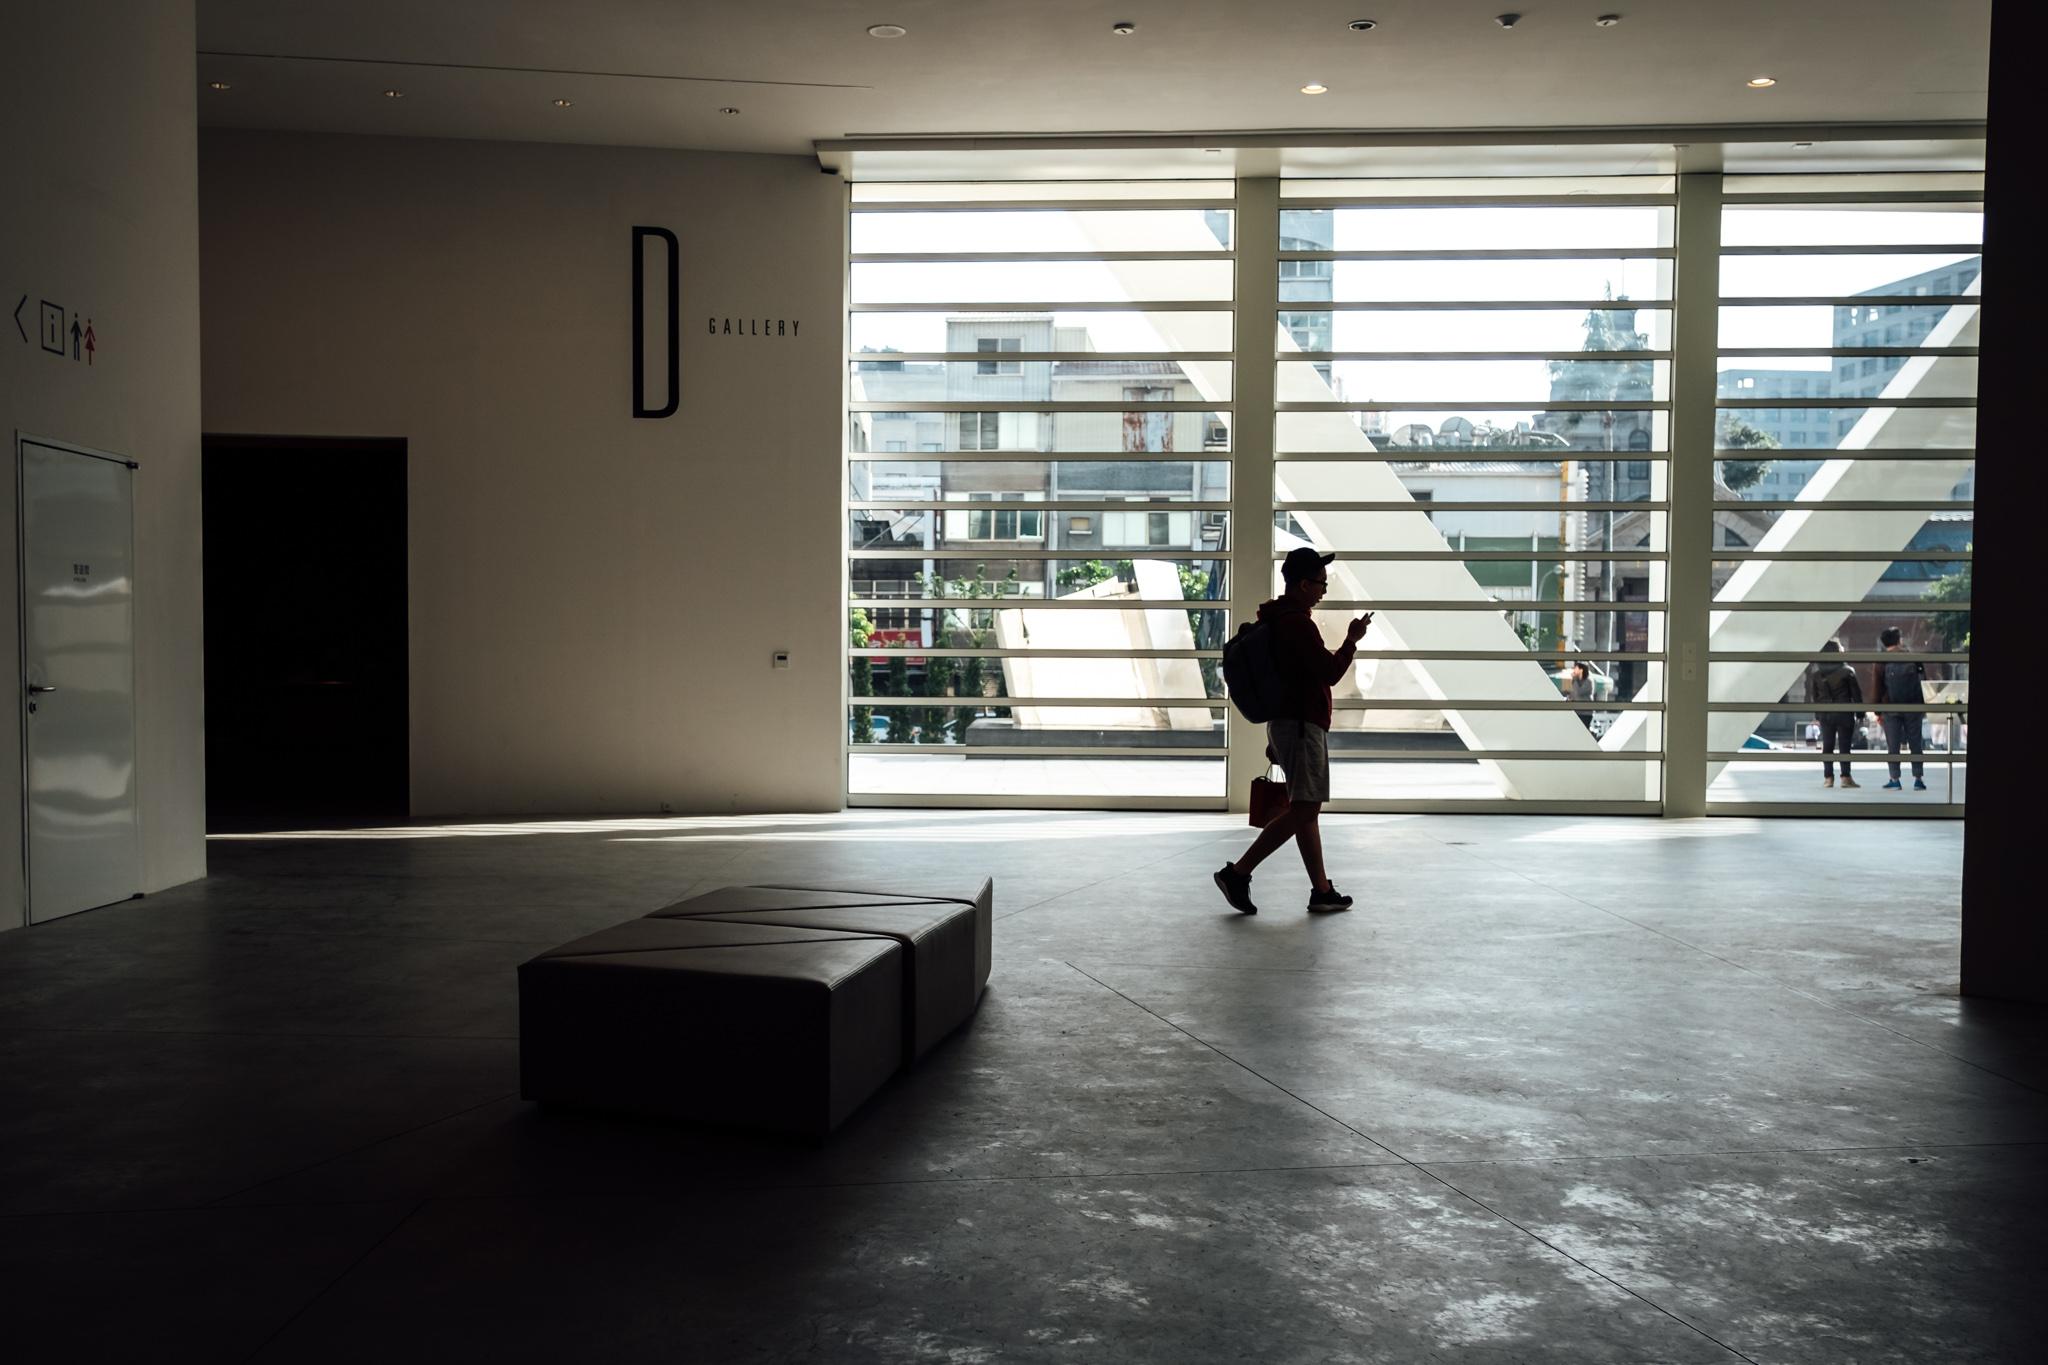 臺南市美術館2館 – Inside of a newly built Tainan City Art Museum Building 2